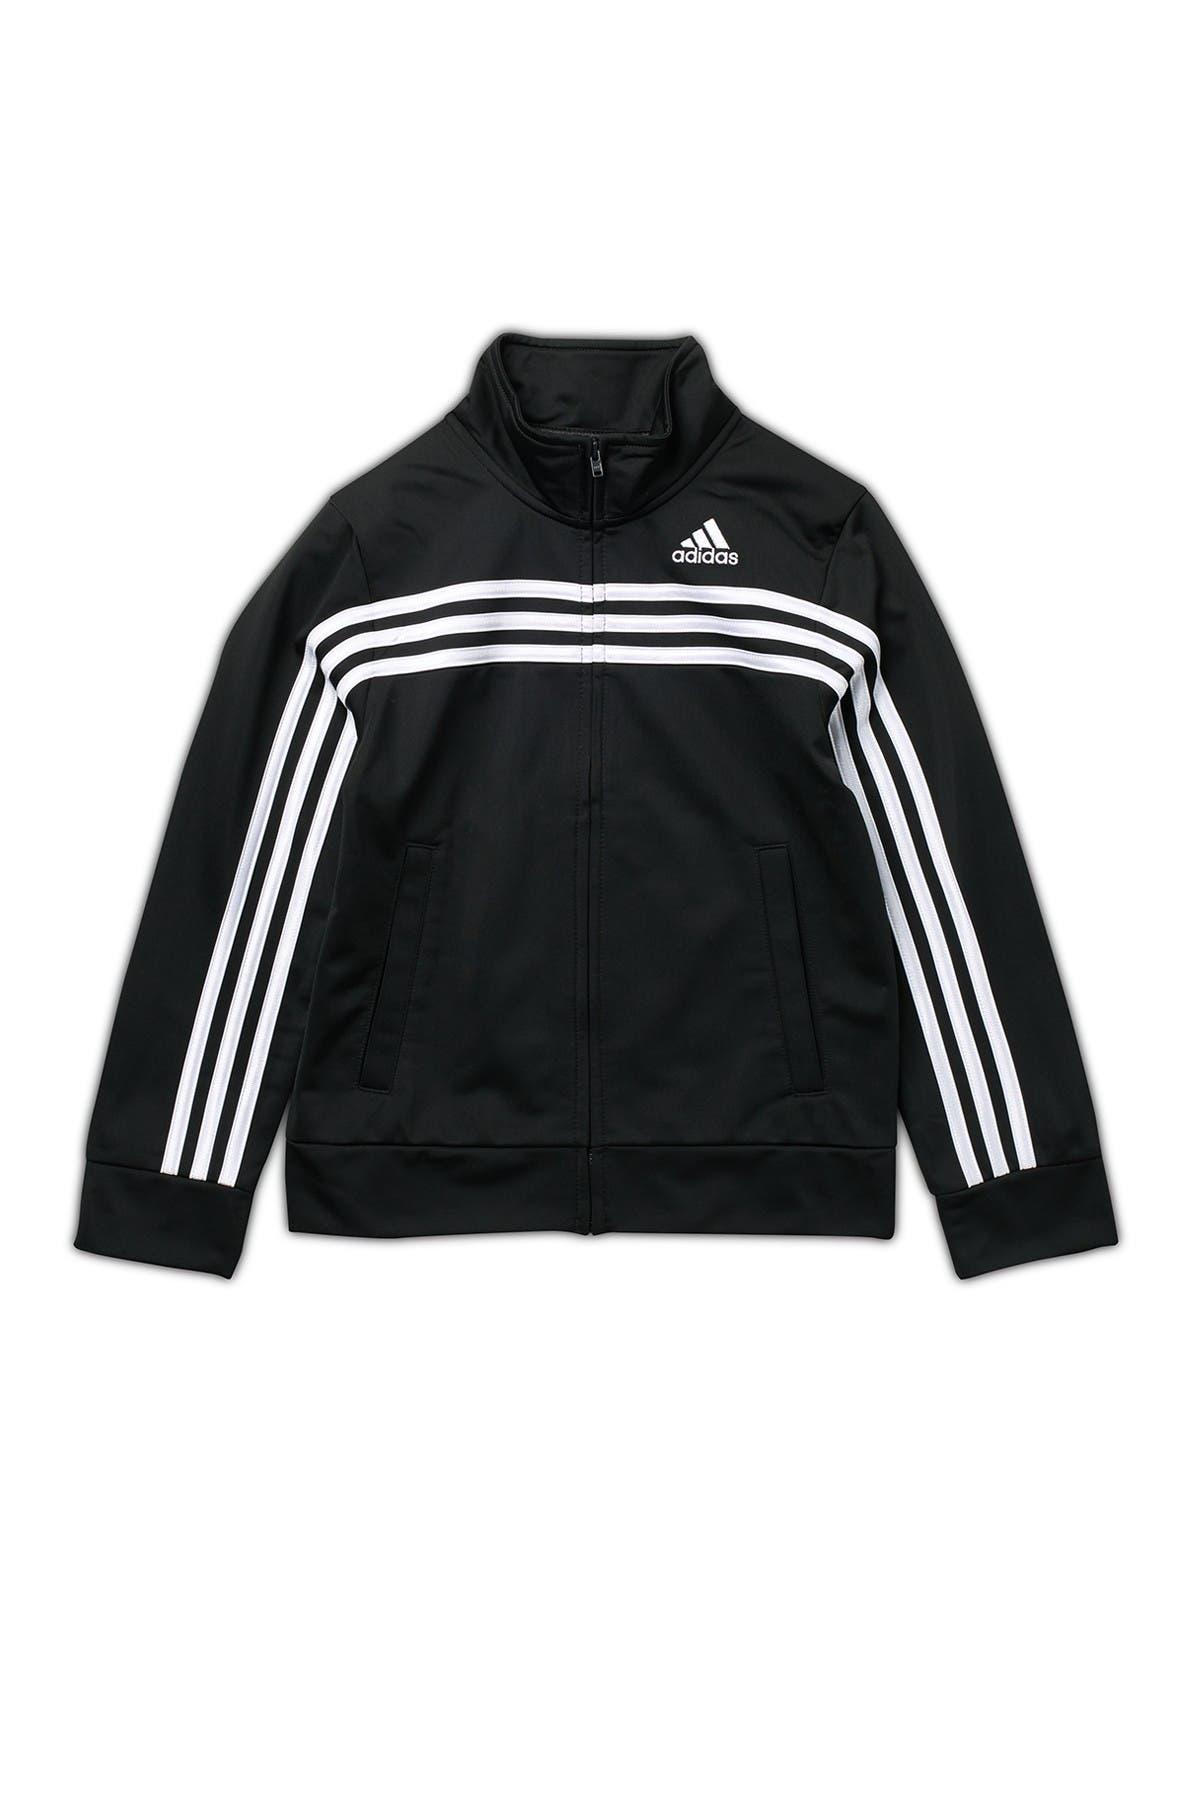 Image of ADIDAS ORIGINALS Classic 3-Stripes Tricot Jacket